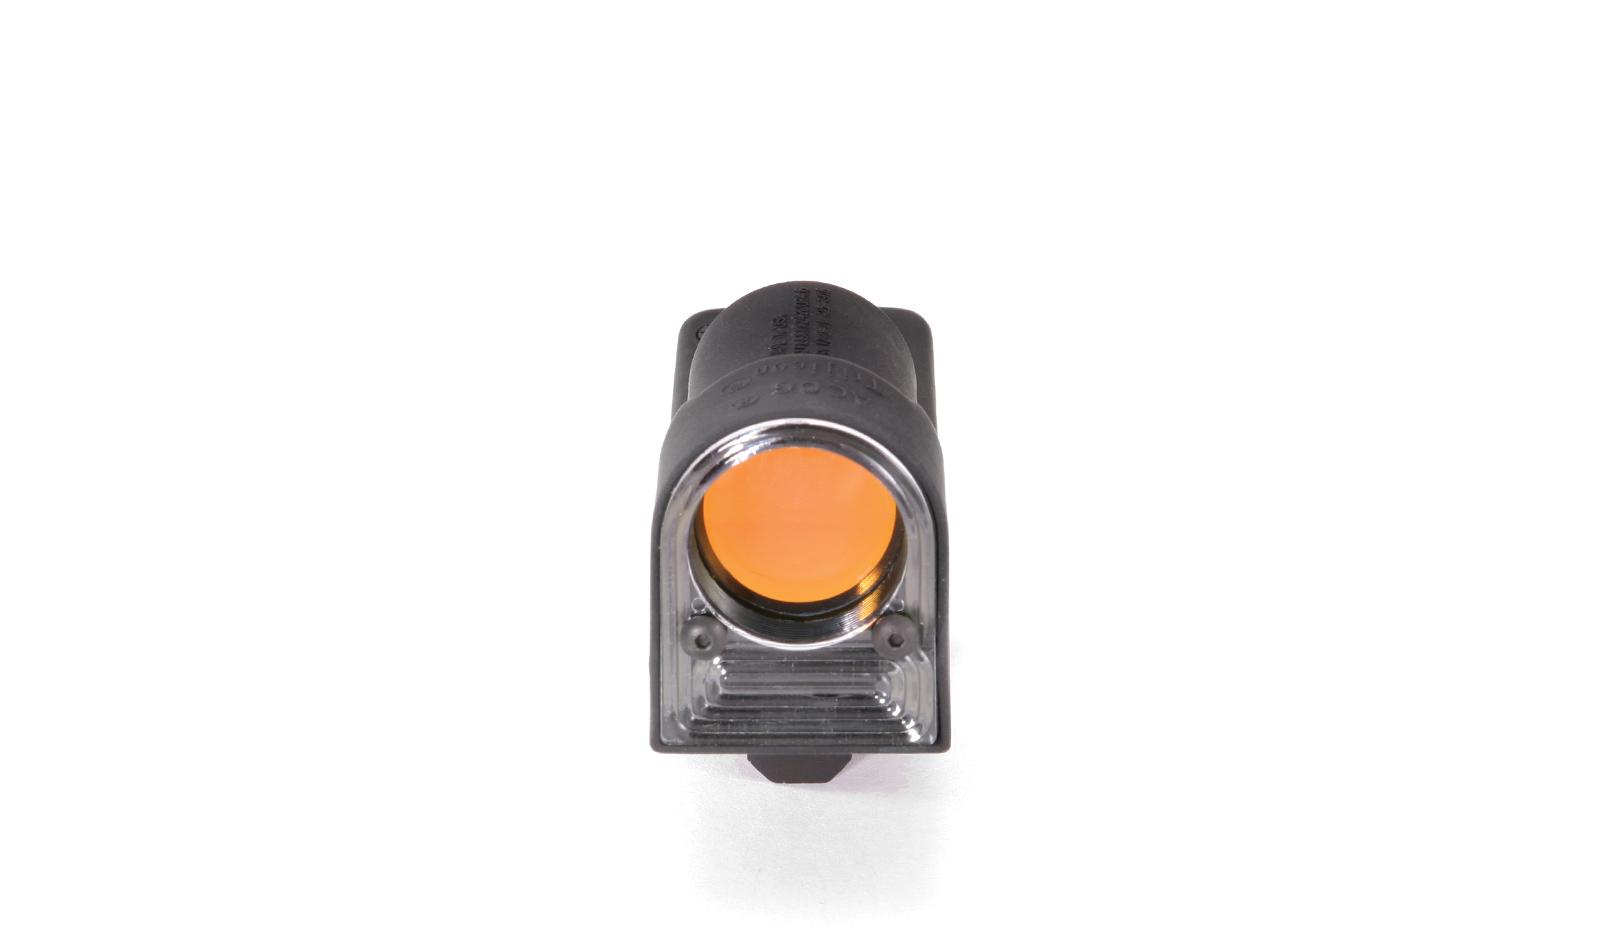 RX06-25 angle 8